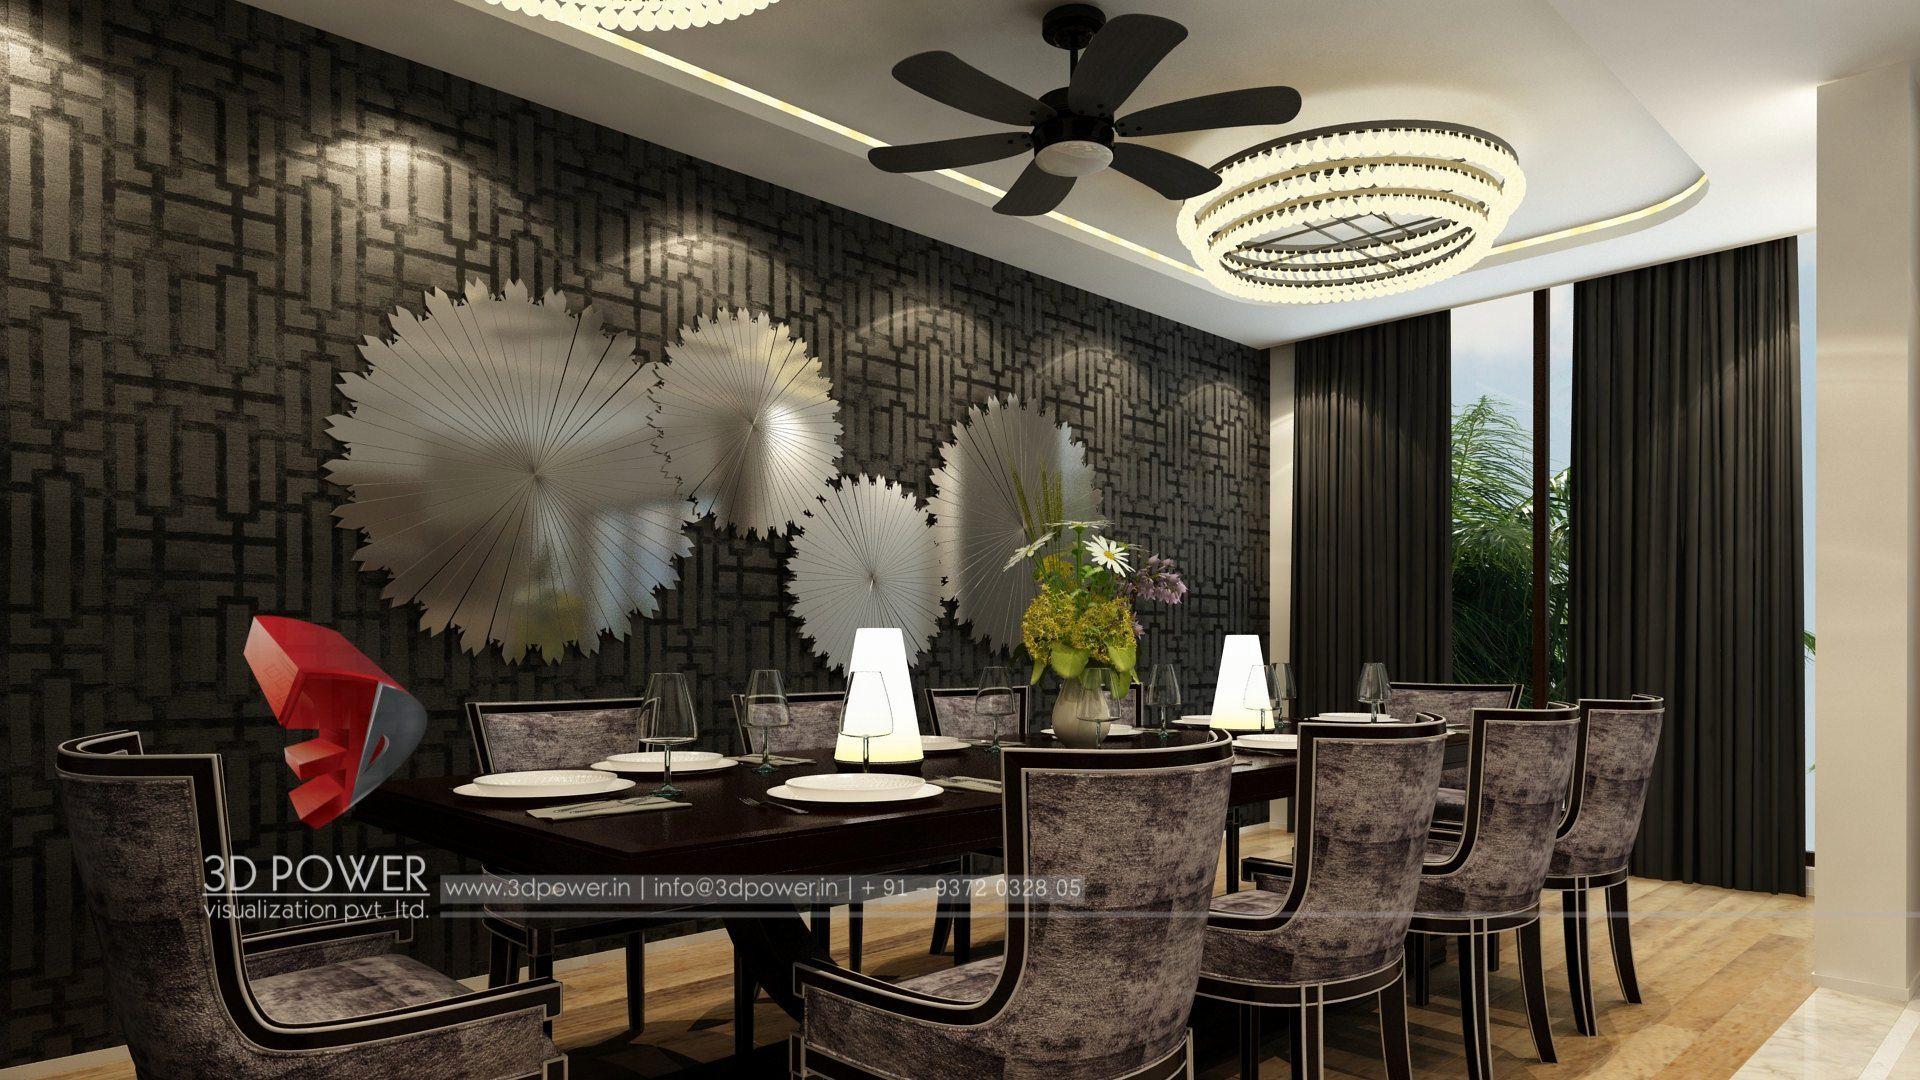 residential studio renders vizualizations rendering exterior project room kitchen living design render interior australia cover australian artroom